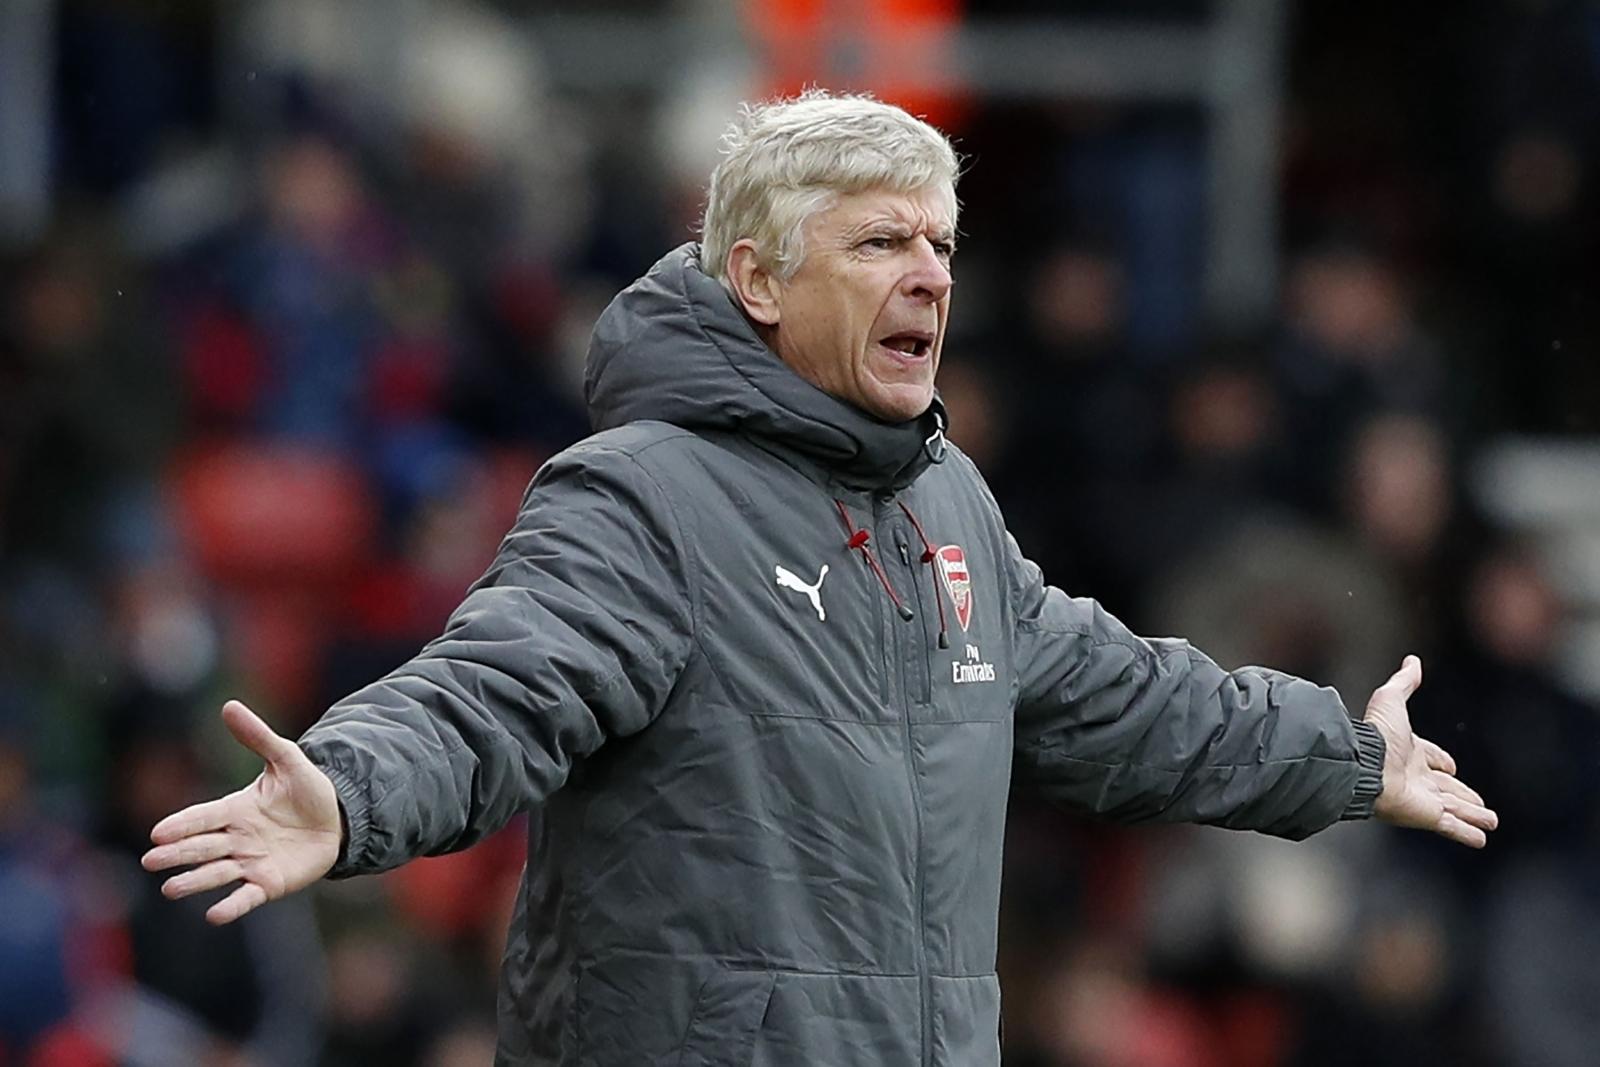 Jurgen Klopp admits he could leave Liverpool despite results